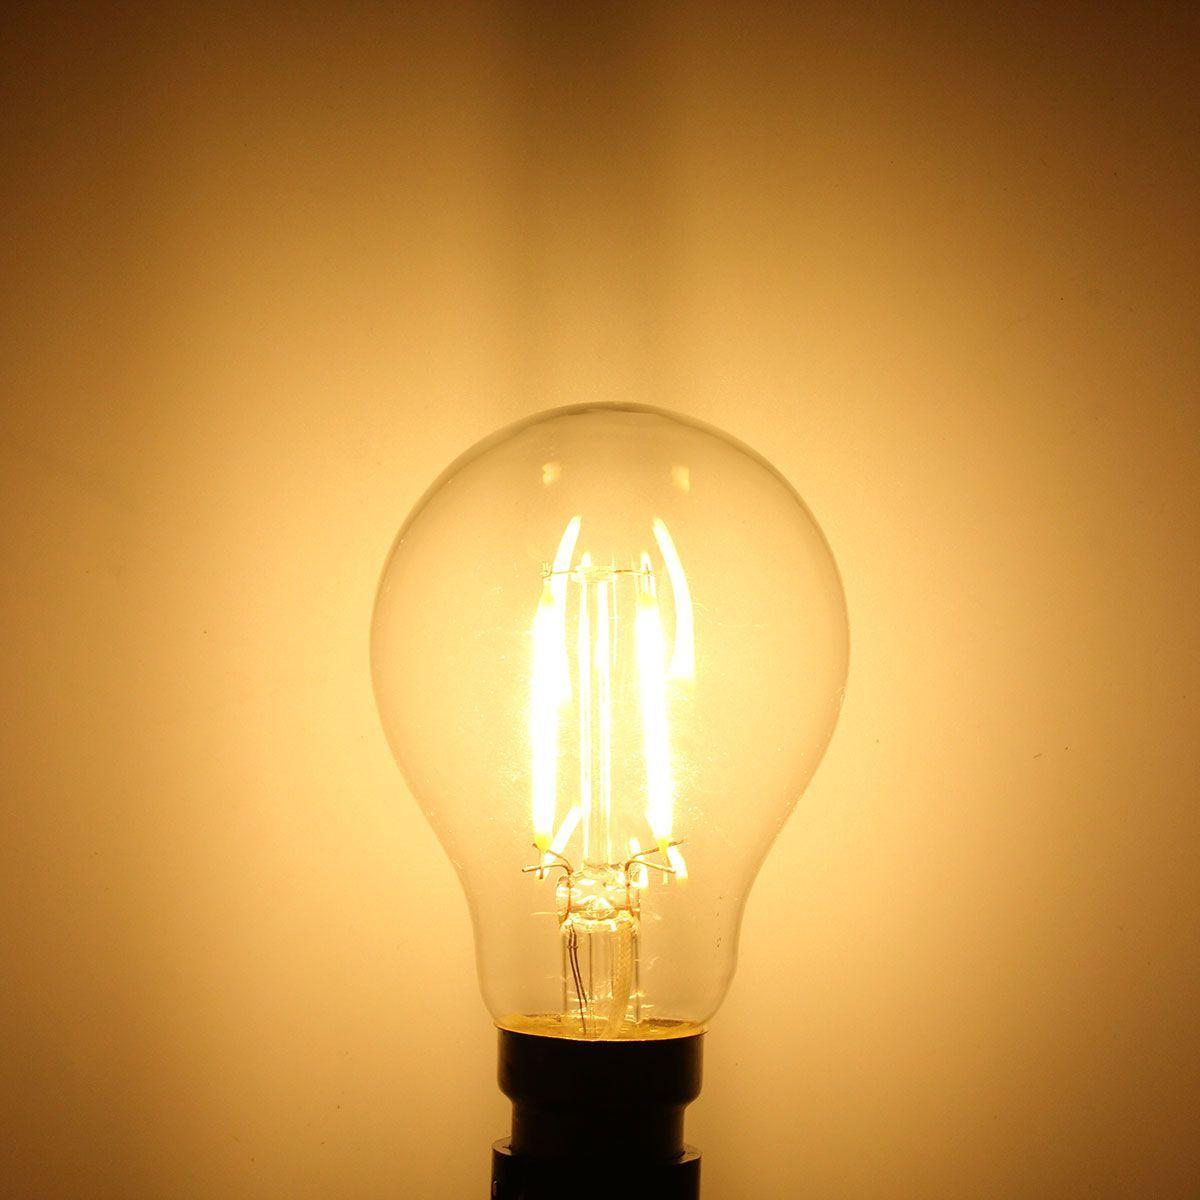 Wholesale Price Free Shipping B22 Led Bulbs A60 B22 4w White Warm White Cob Led Filament Retro Edison Bulbs Ac 220v Bulb Led Light Bulbs Bulb Edison Bulb